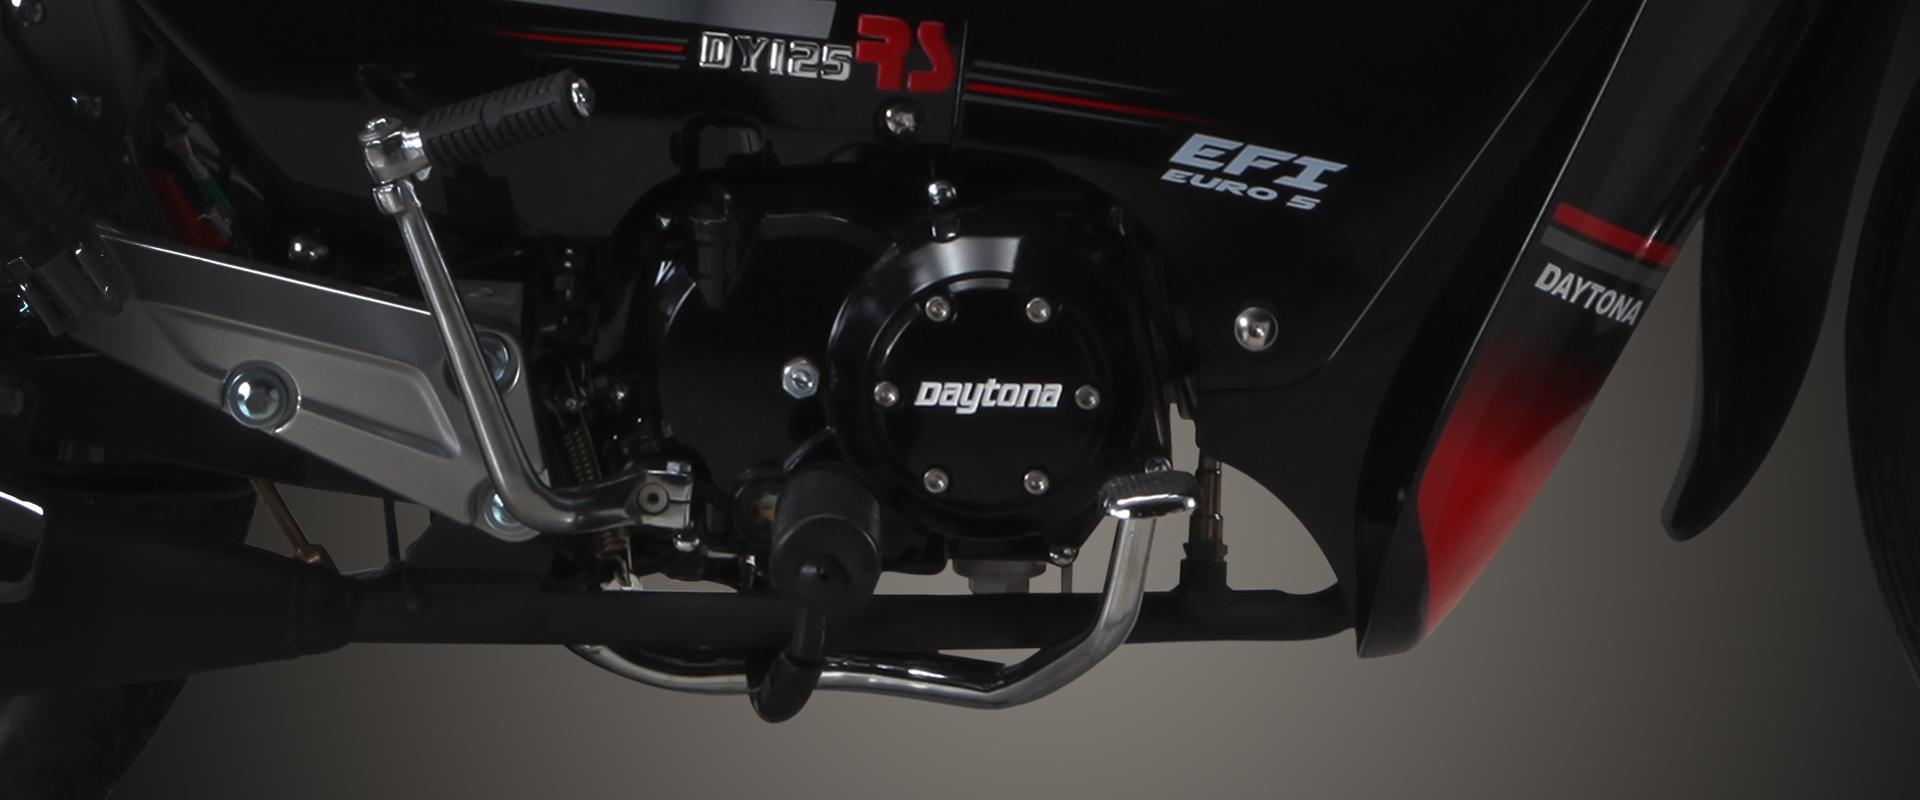 Daytona DY125RS 2021 – Αναβαθμίστηκε σε Euro 5 με δωράκια - BIKEIT!